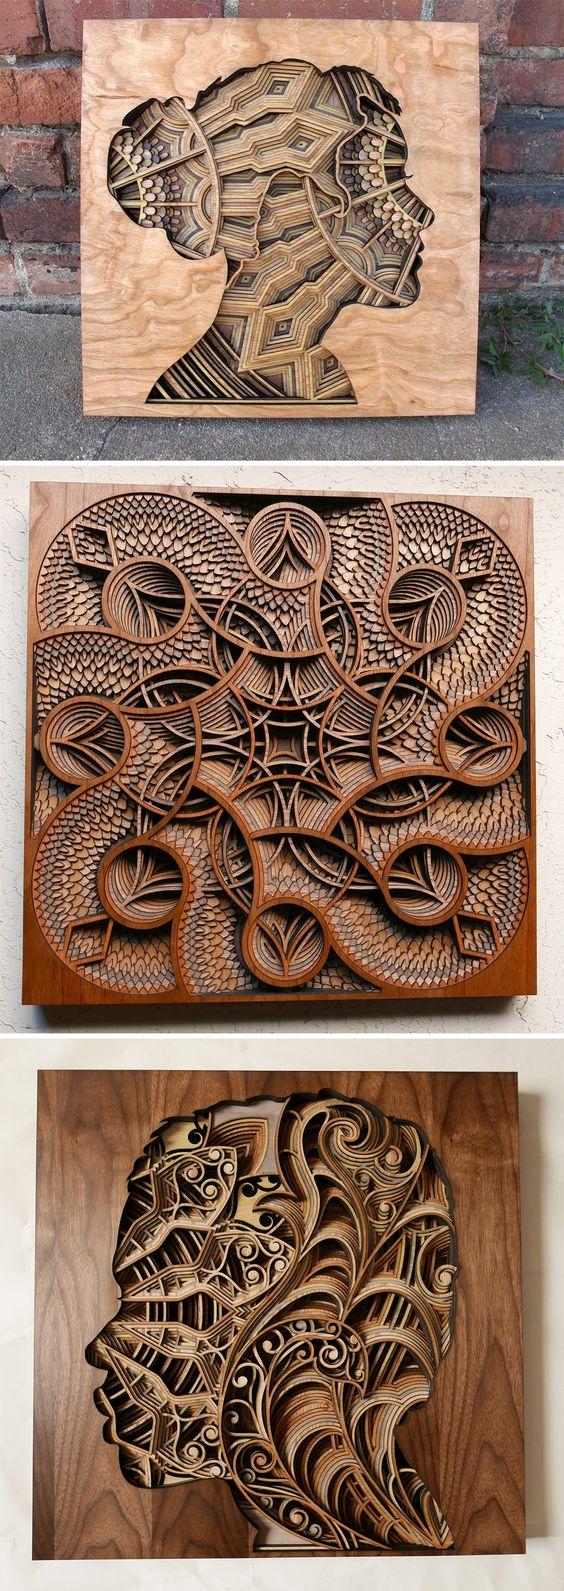 New Laser-Cut Wood Relief Sculptures by Gabriel Schama: